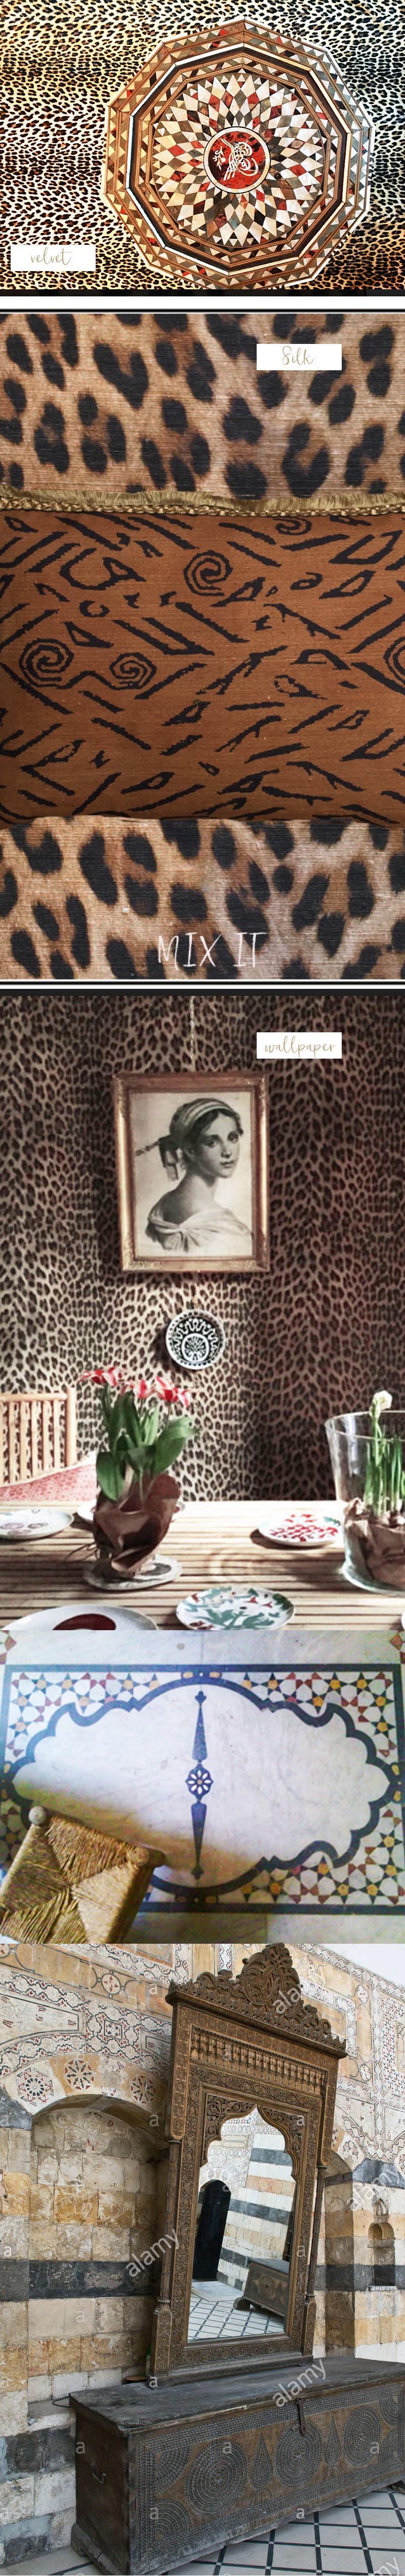 blog tibetan leopard